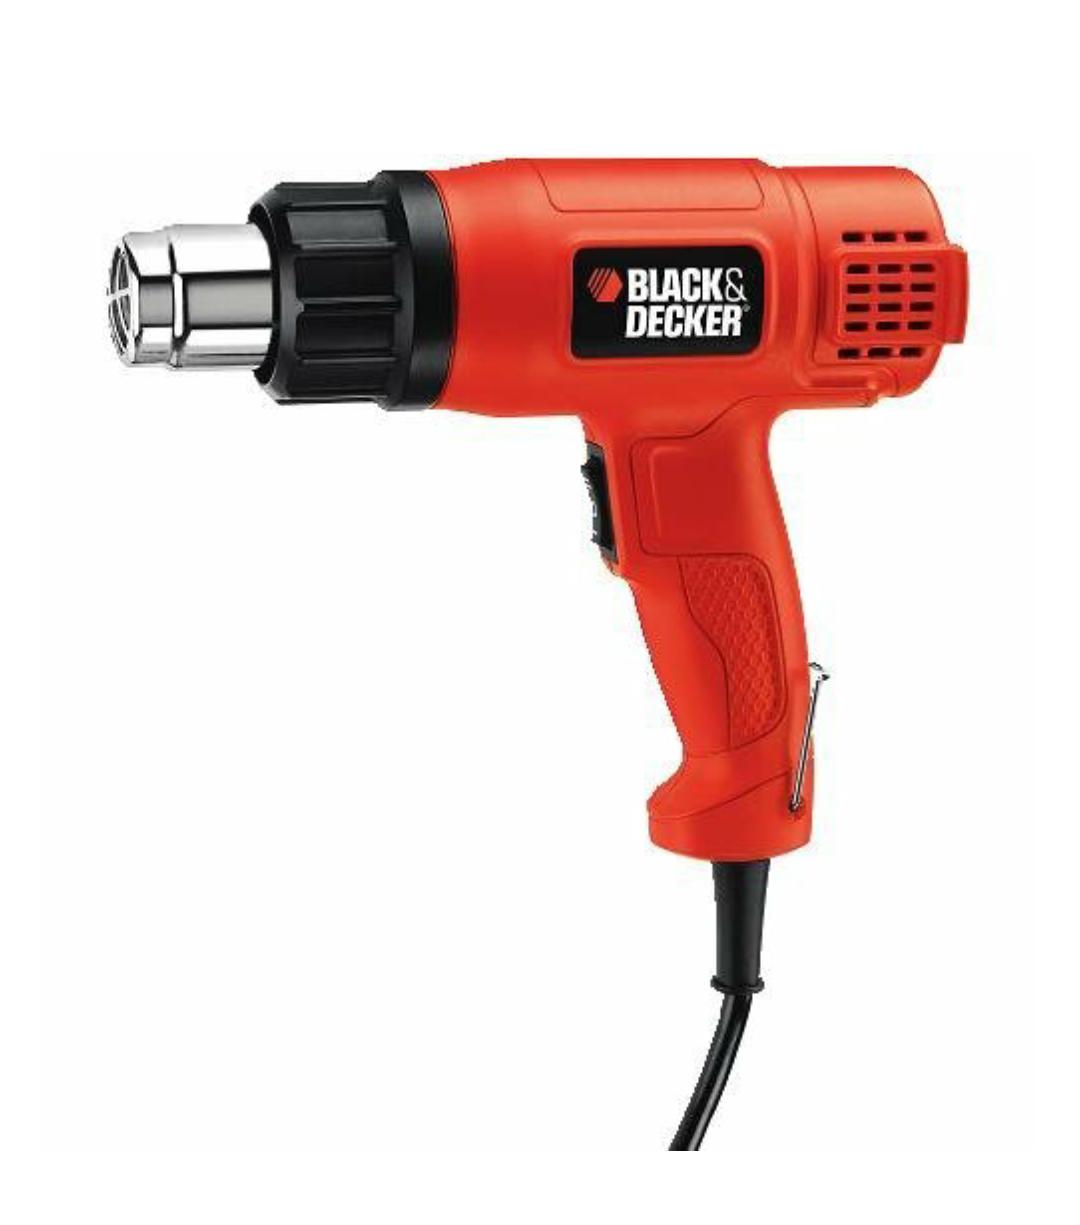 BLACK+DECKER KX1650-GB Heat Gun - Was £24.99 Now £14.00 prime / £17.99 non prime @ amazon